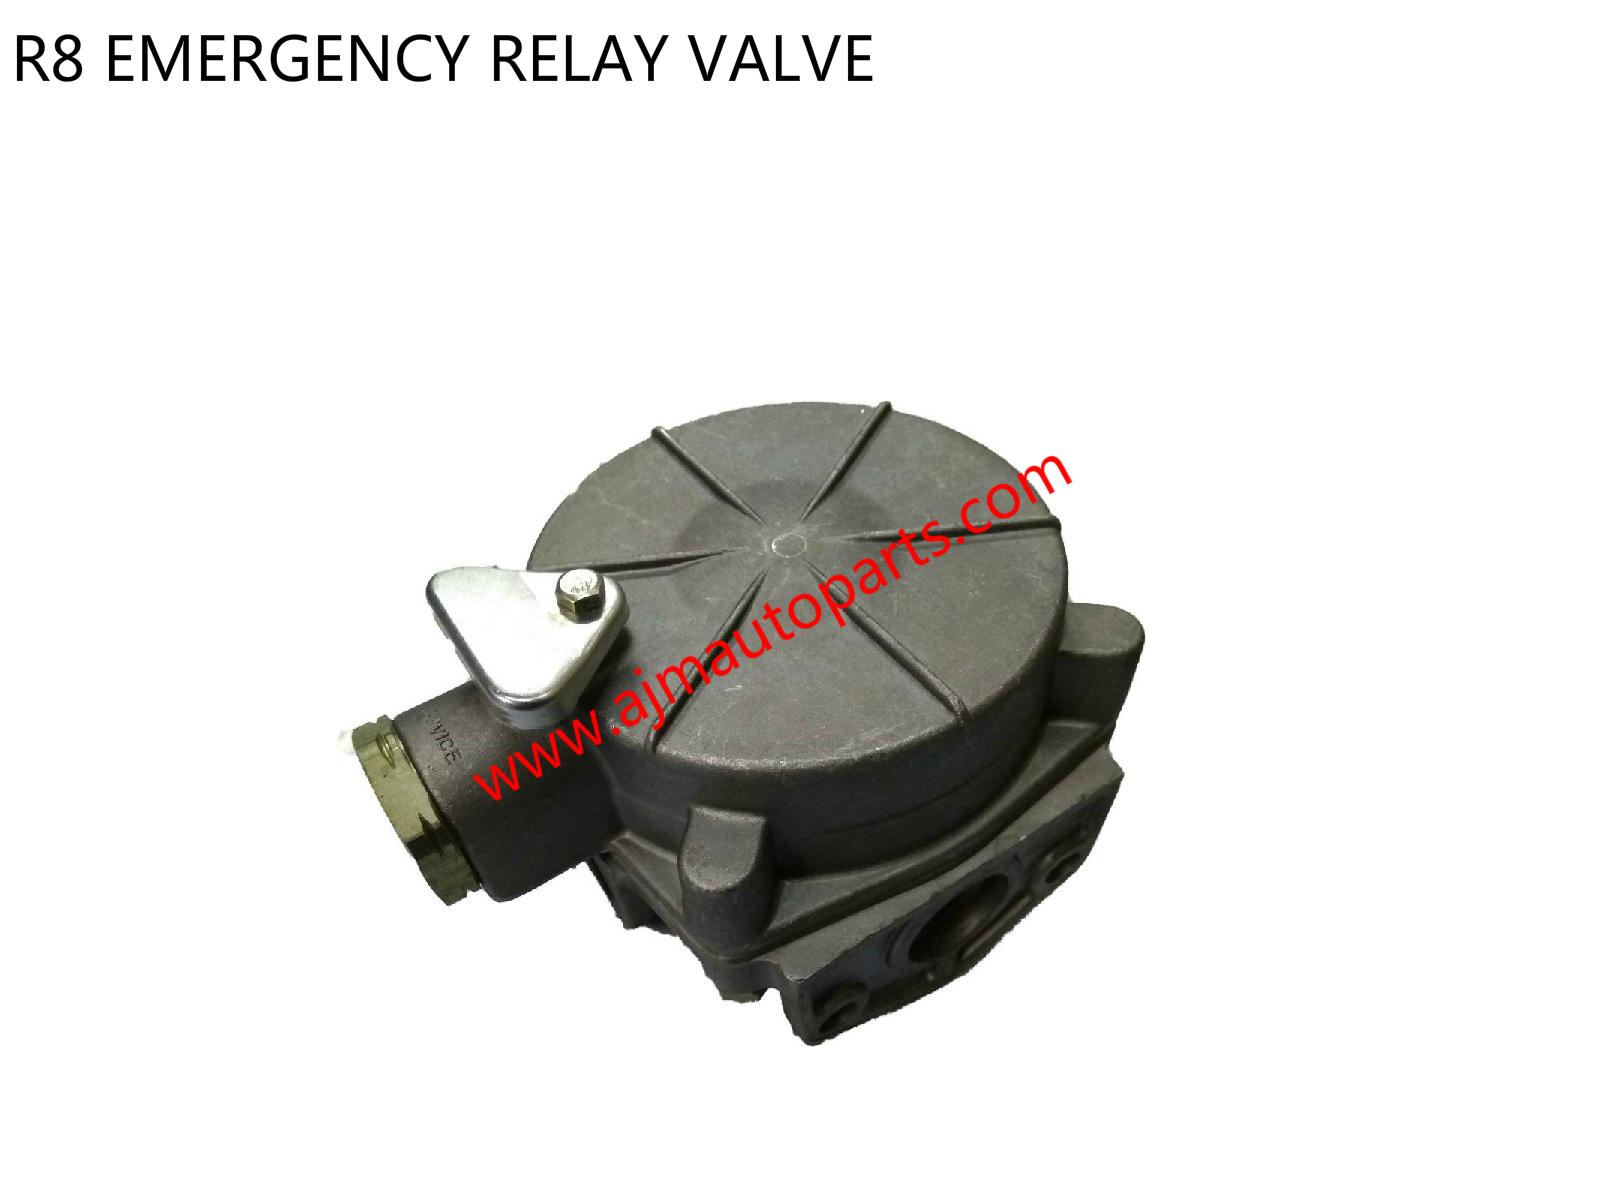 R8 EMERGENCY RELAY VALVE